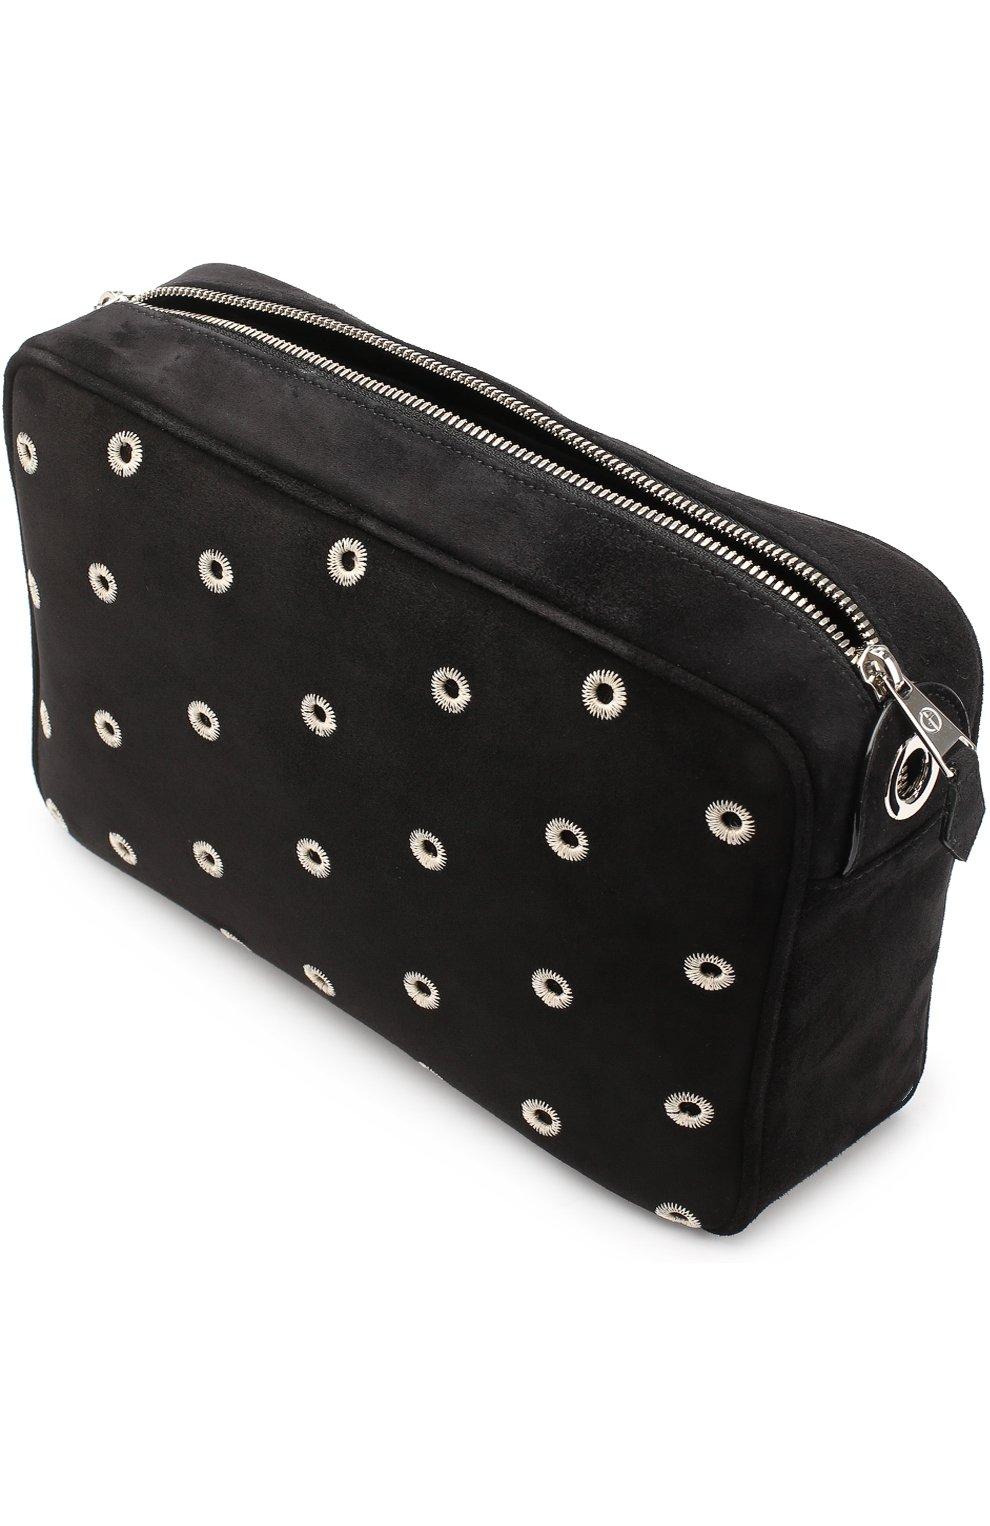 92aed5582923 Женская сумка из замши с вышивкой GIORGIO ARMANI черная цвета ...